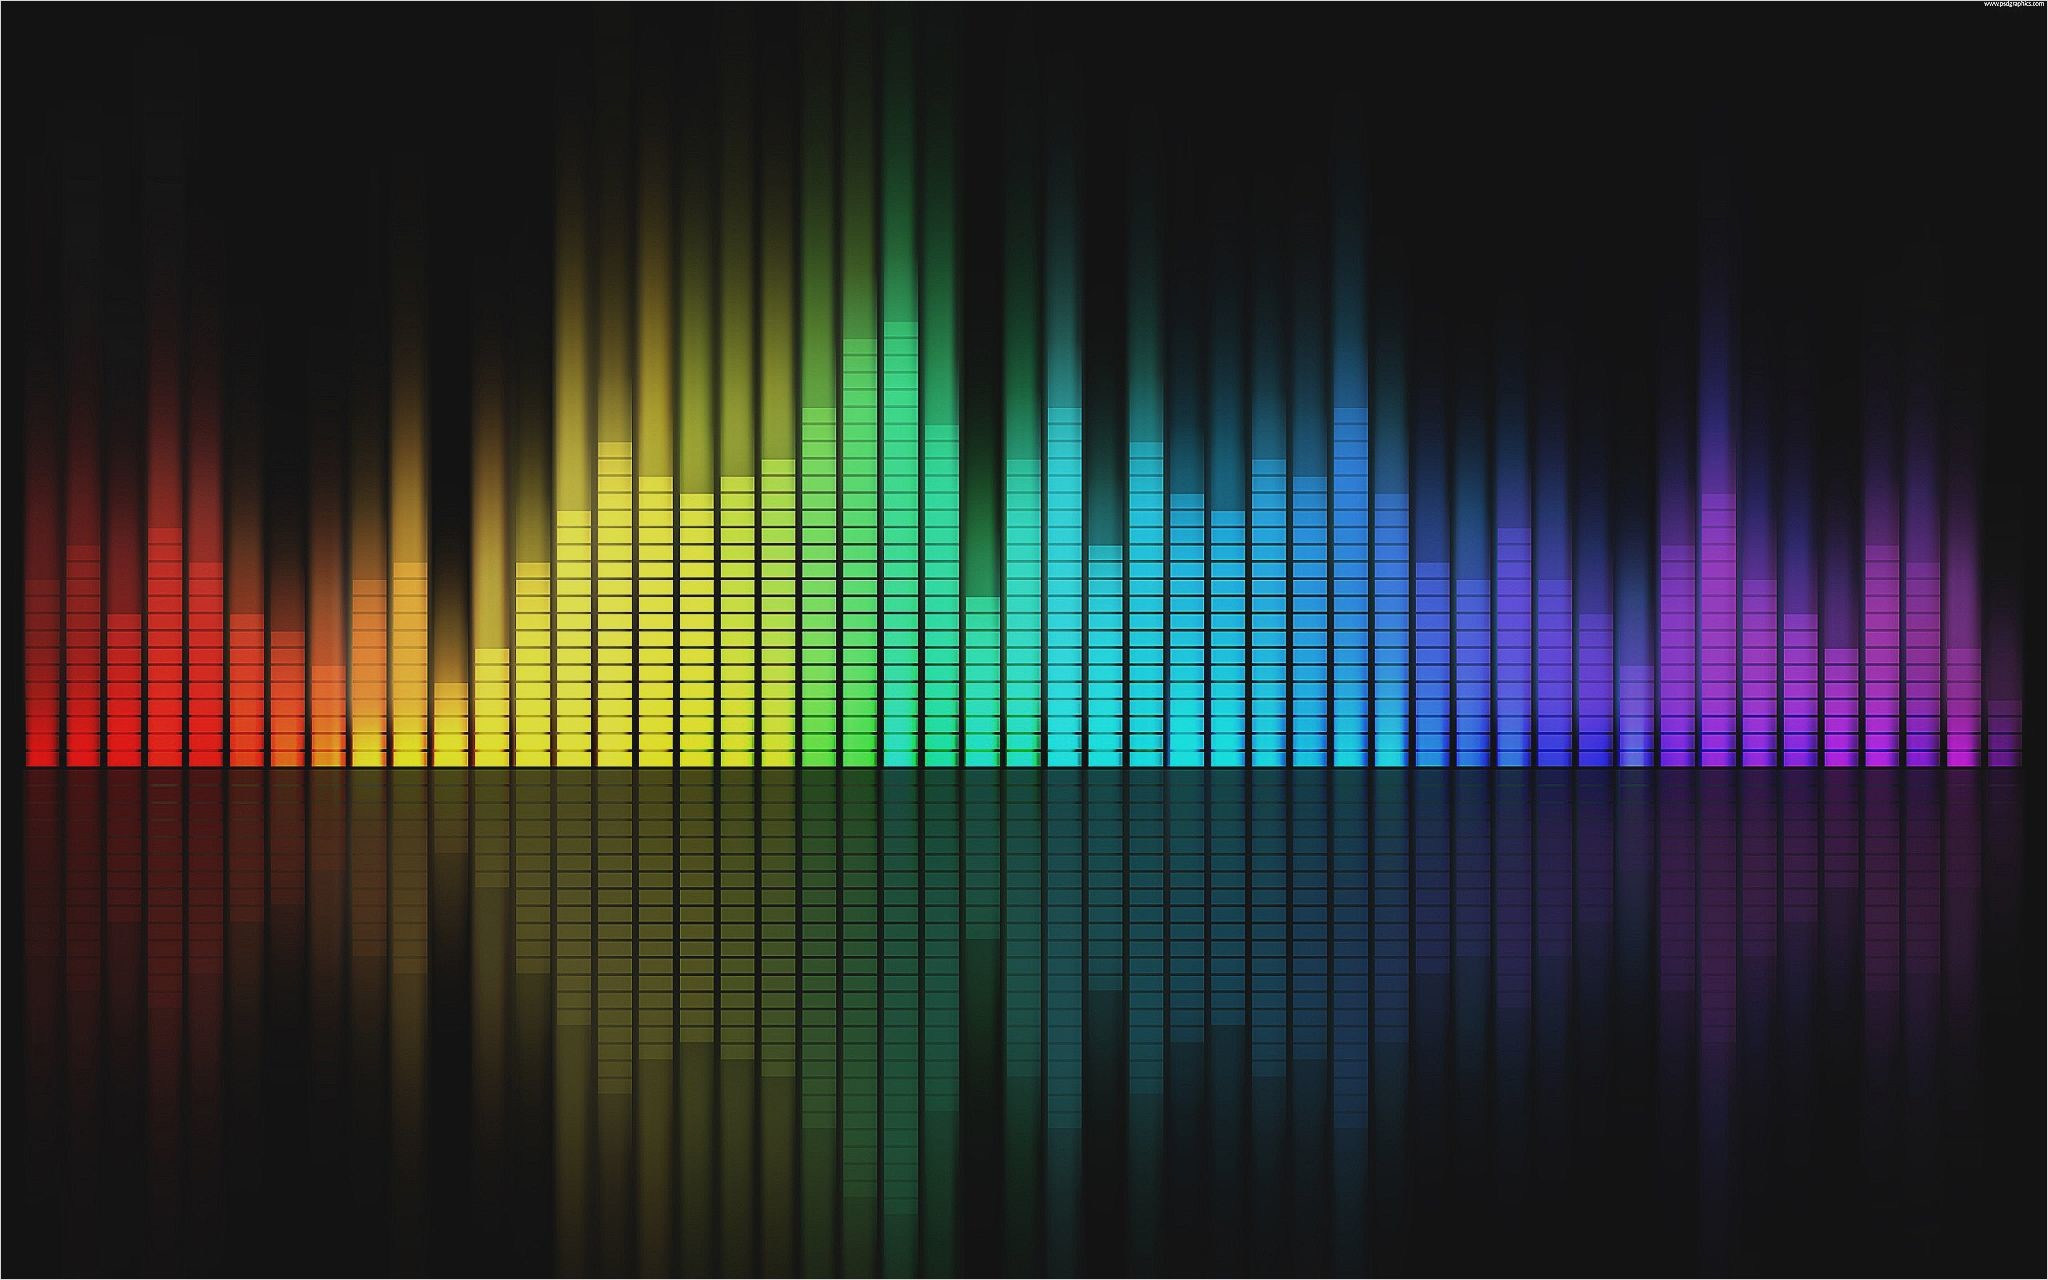 2048x1280, Cool Dj Wallpapers - Music Desktop Background - 2048x1280  Wallpaper - Teahub.io